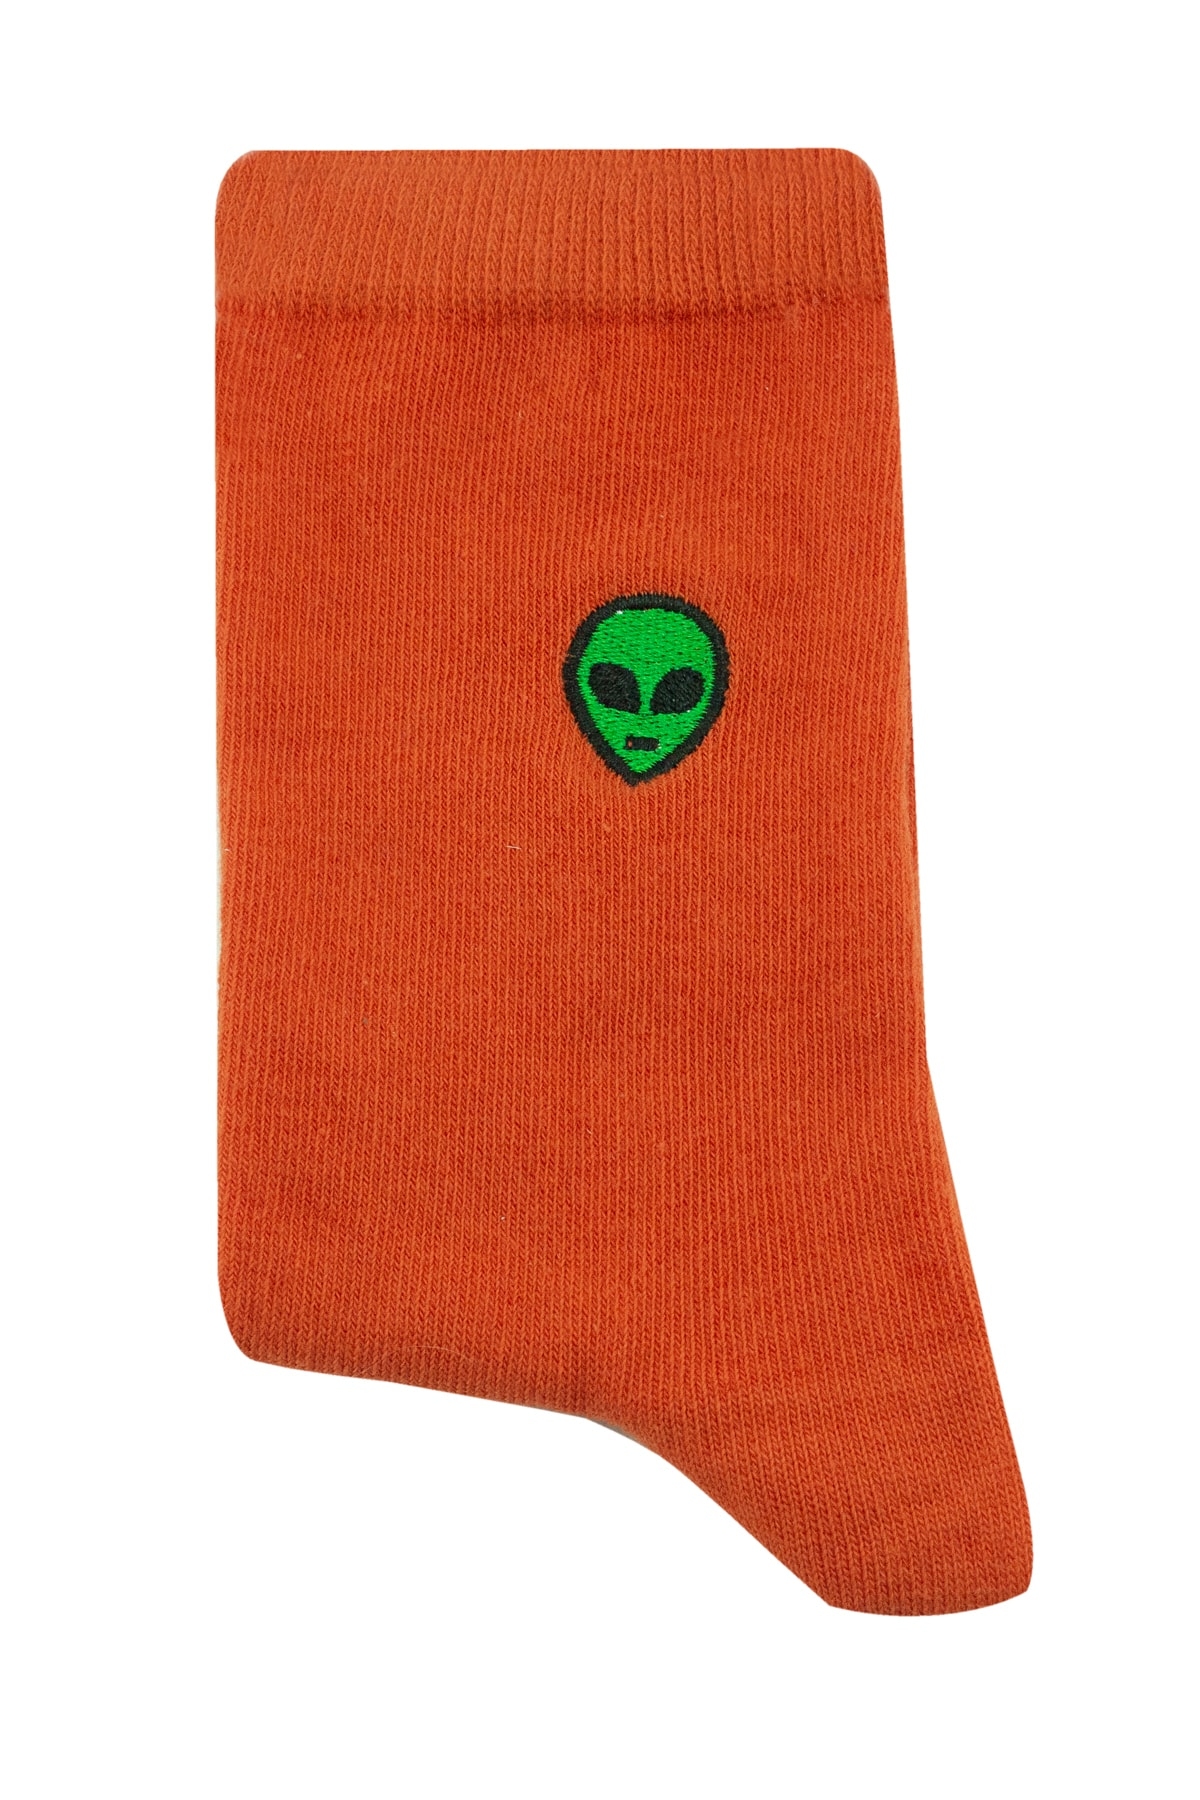 Socksarmy Uzay Maceraları Desenli 6 'lı Çorap Seti 2